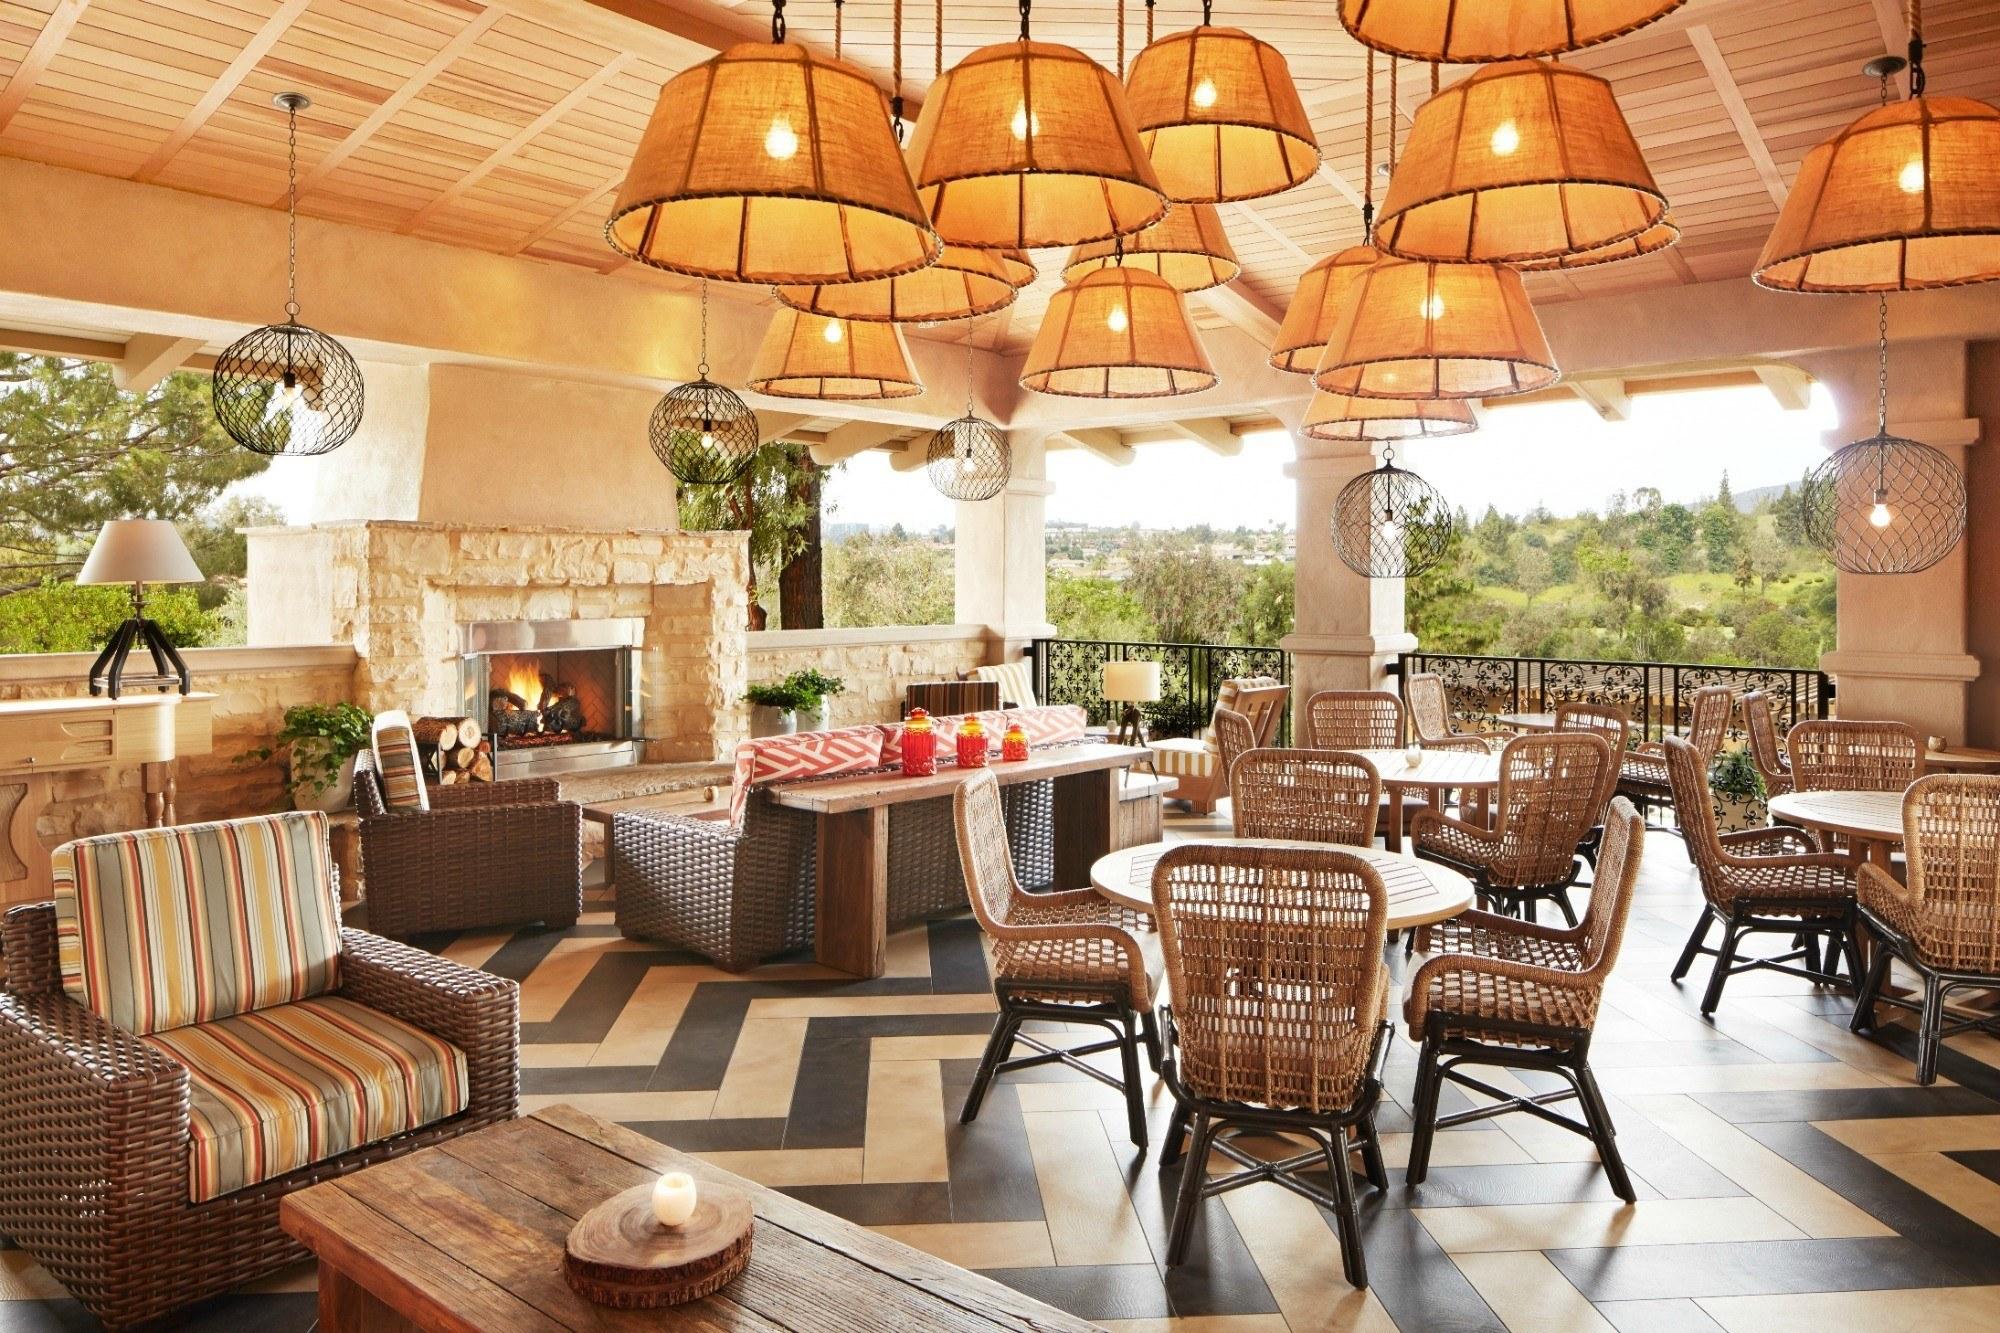 The Rancho Bernardo Inn is one of San Diego's best luxury hotels.